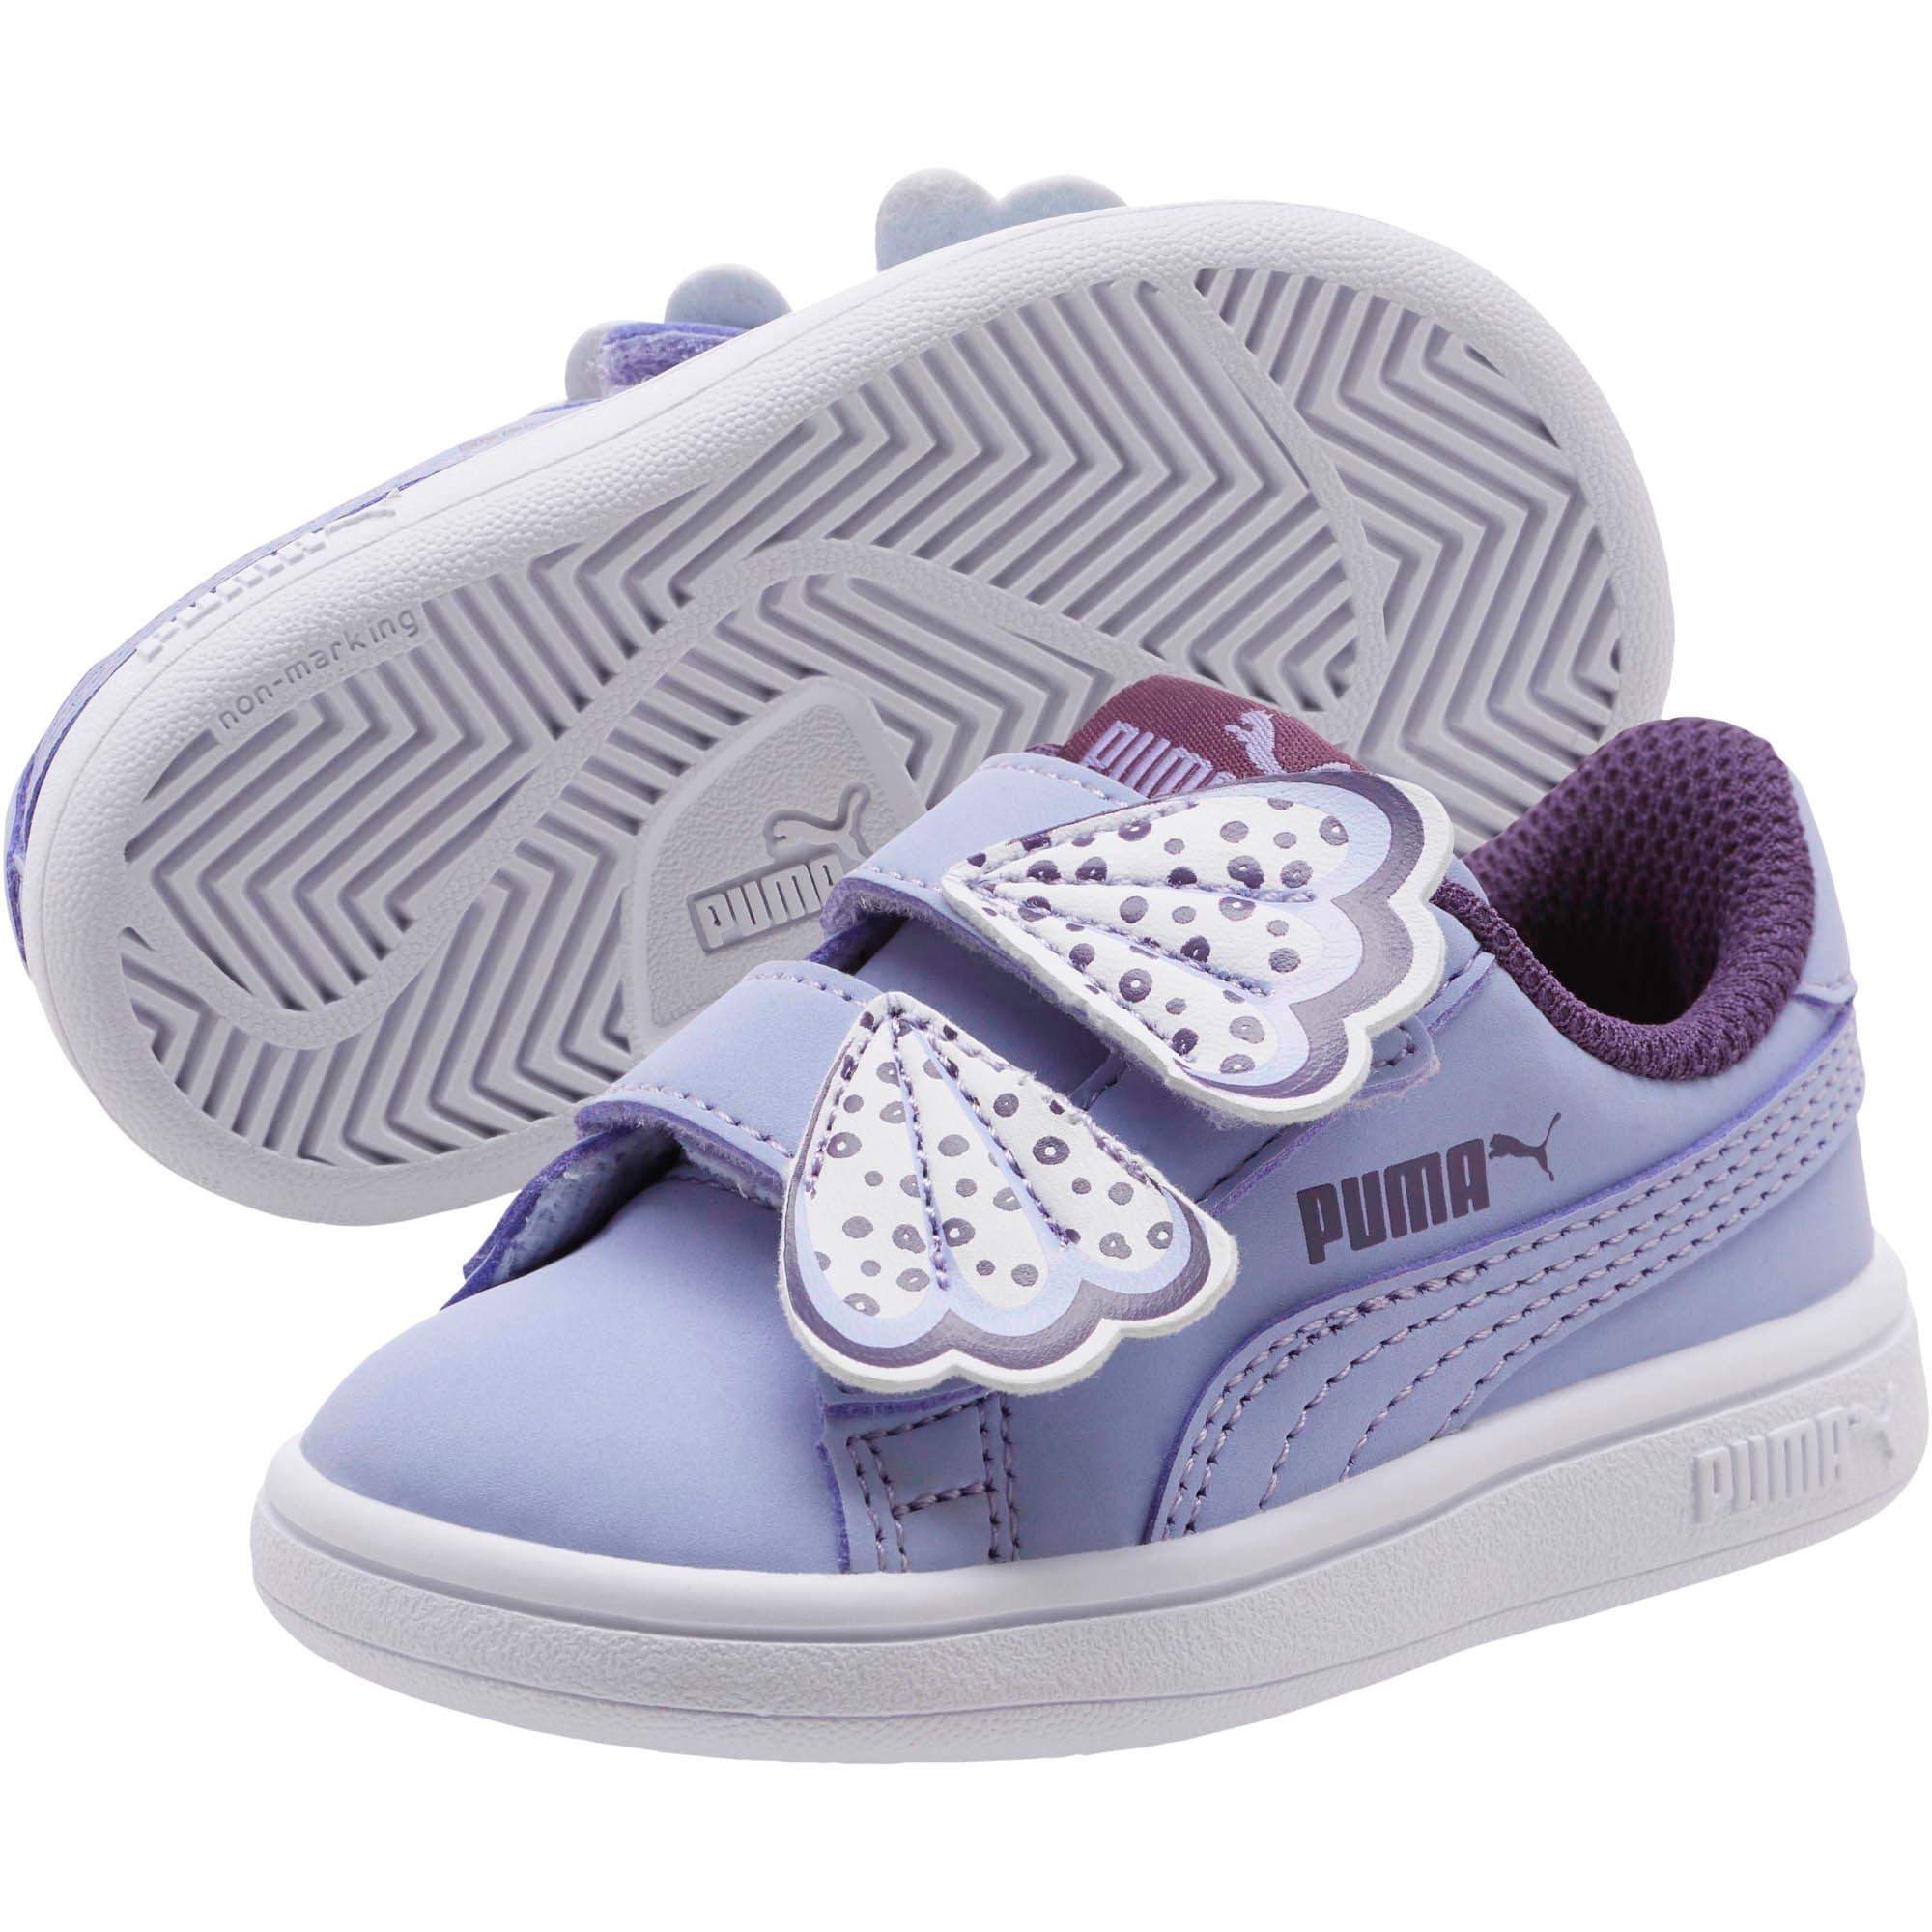 Thumbnail 2 of PUMA Smash v2 Butterfly AC Toddler Shoes, Sweet Lavender-Indigo-White, medium